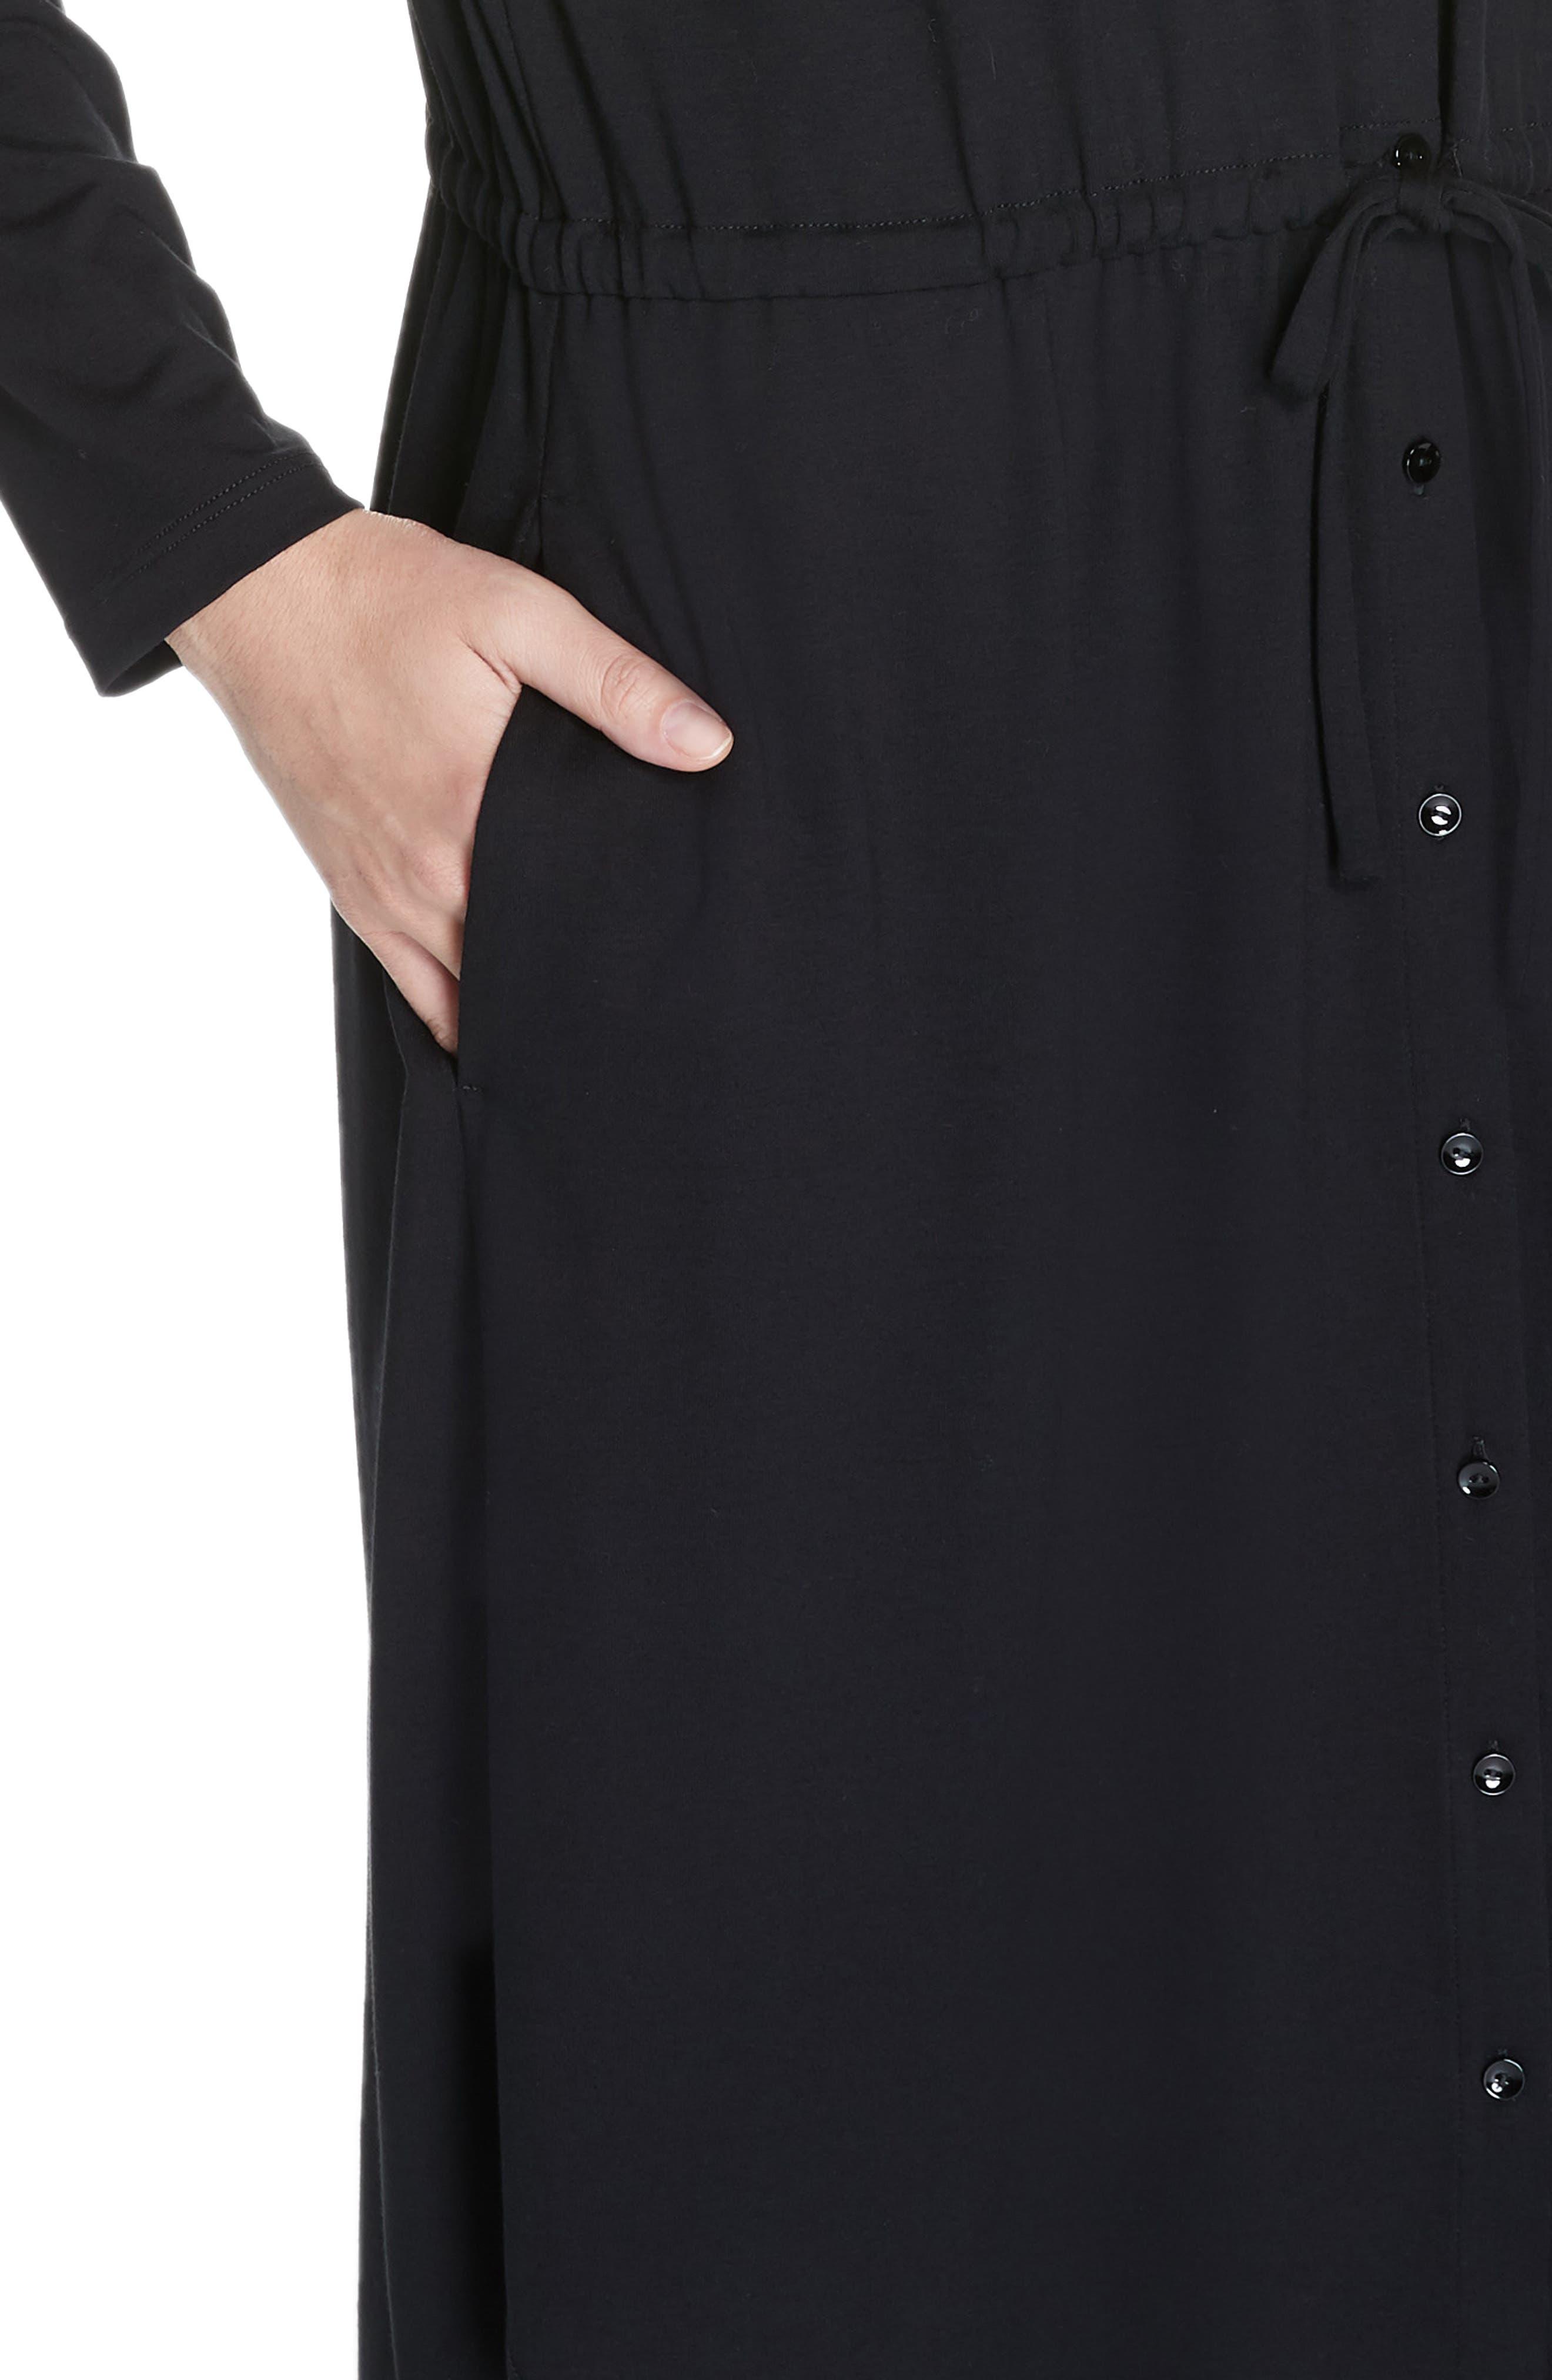 Drawstring Waist Dress,                             Alternate thumbnail 5, color,                             BLACK